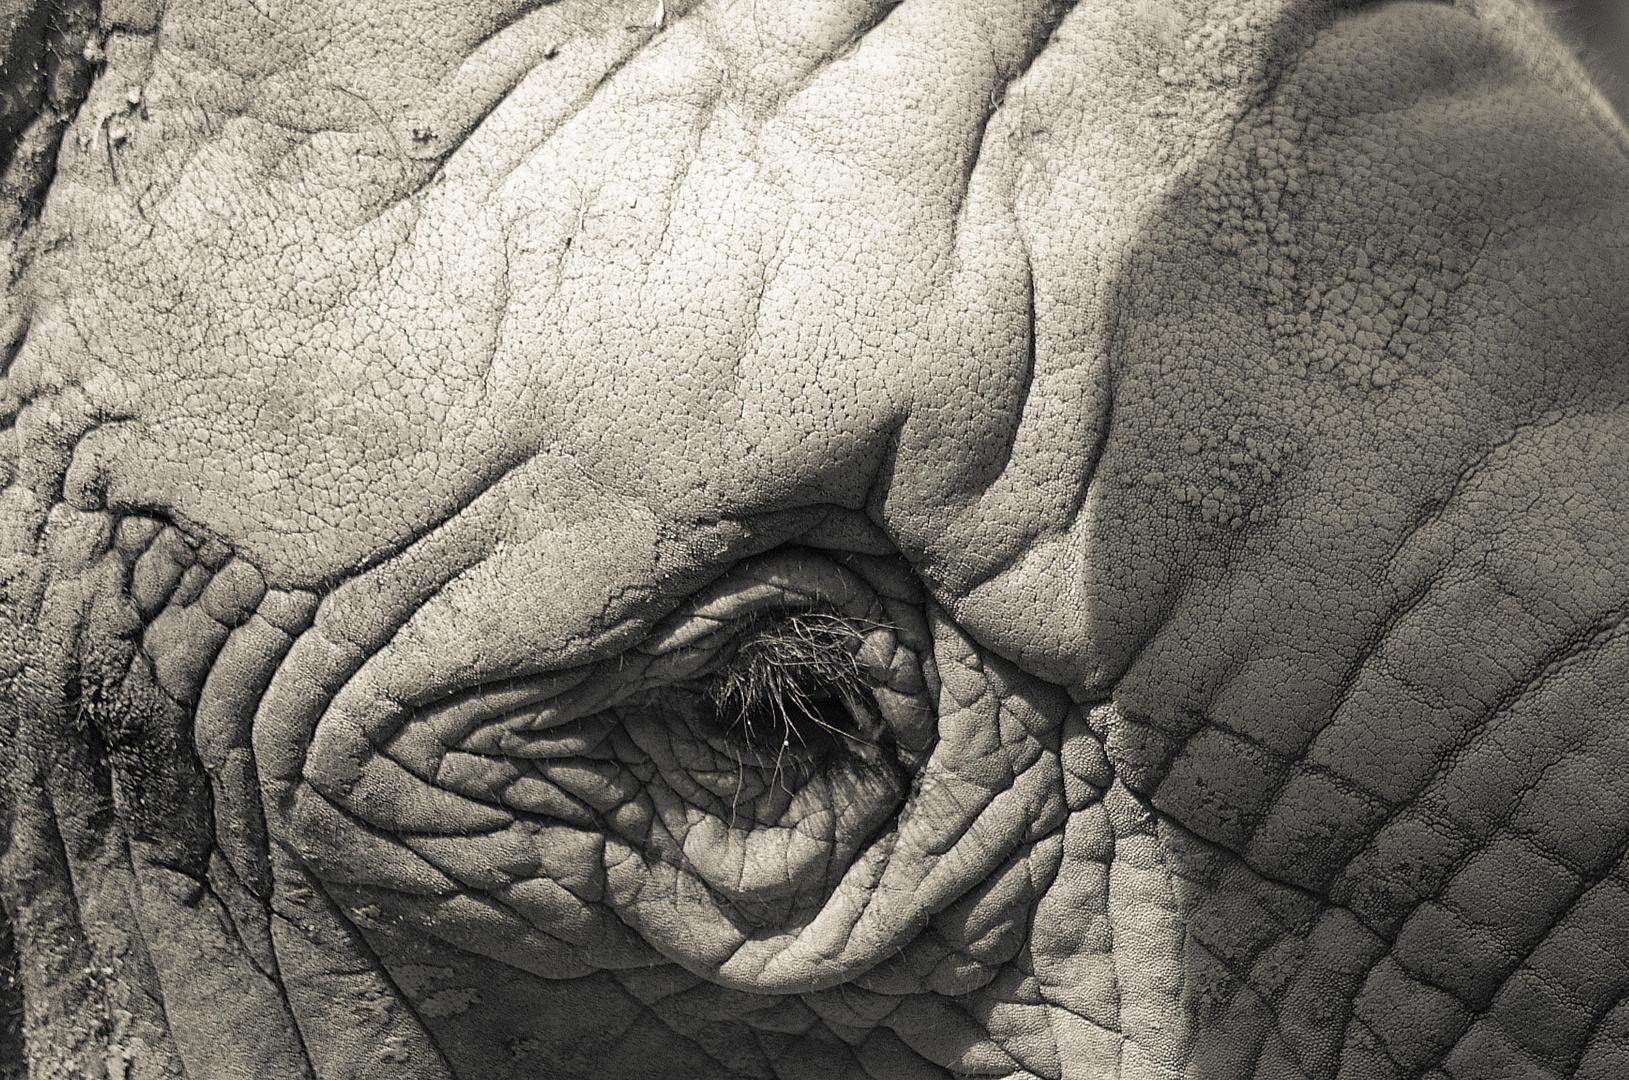 elefantenhaut foto bild tiere zoo wildpark falknerei s ugetiere bilder auf fotocommunity. Black Bedroom Furniture Sets. Home Design Ideas